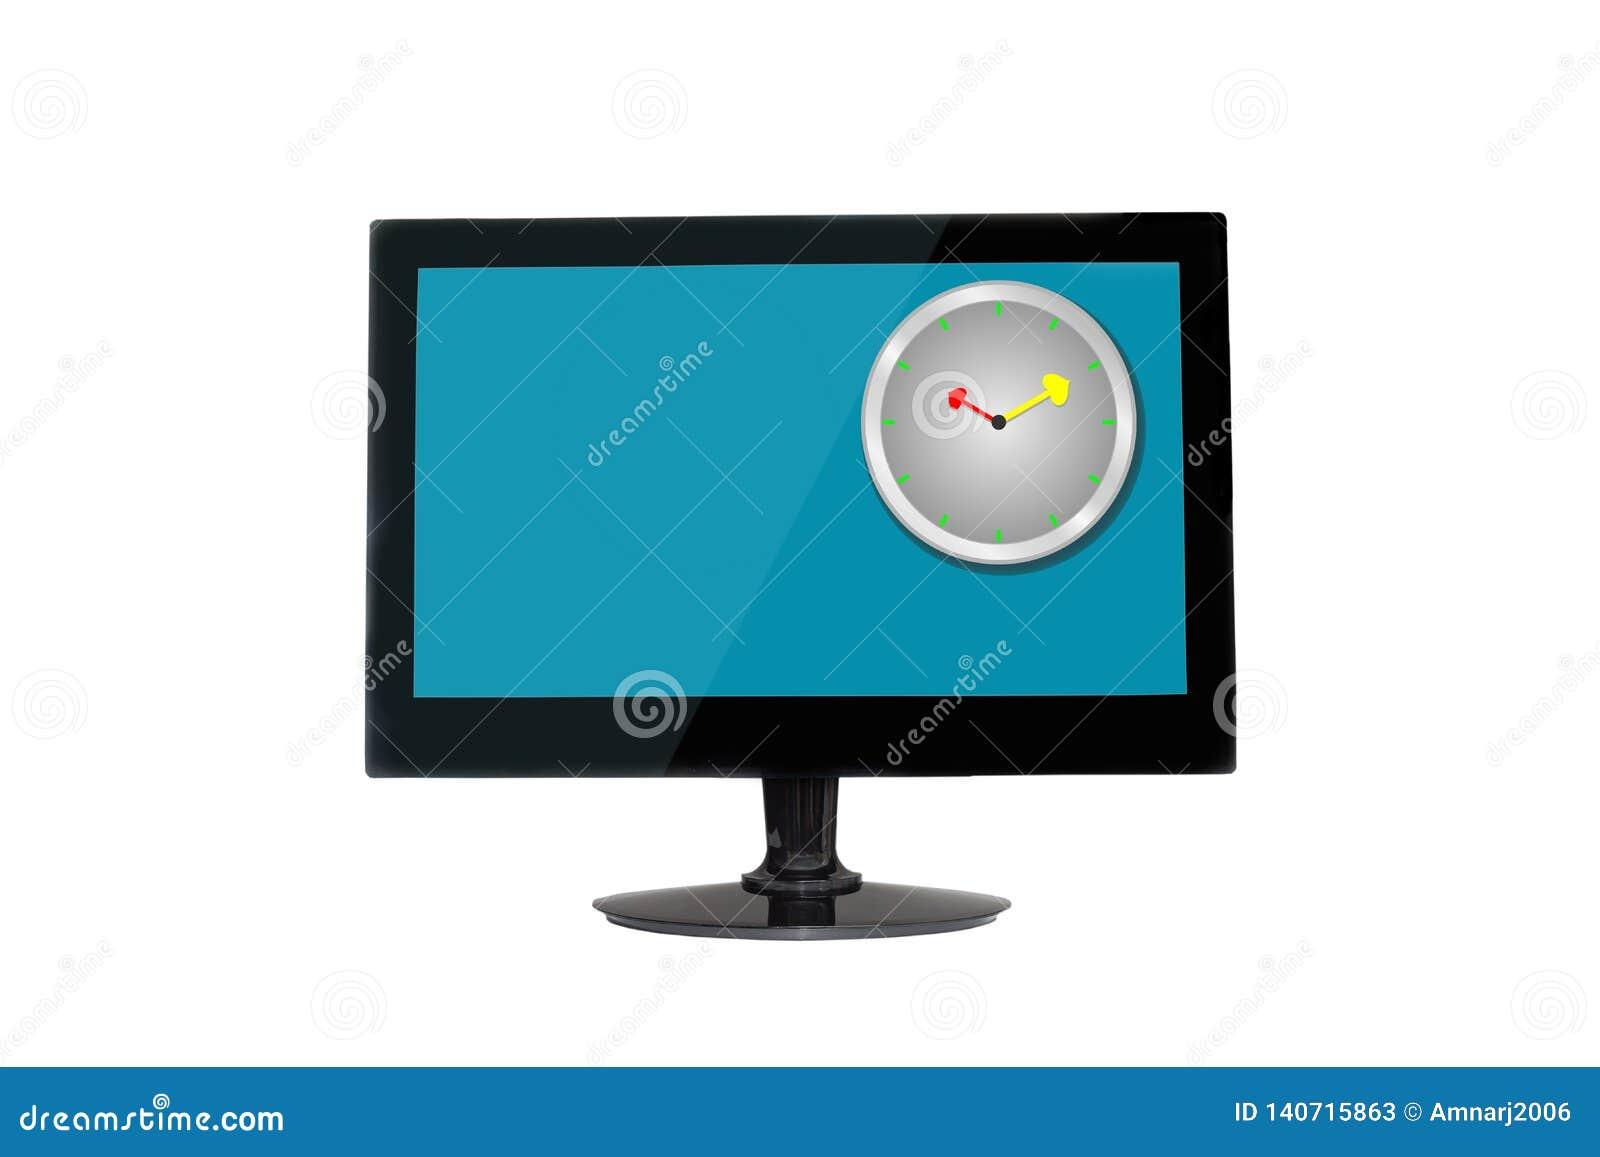 Clock on Modern flat screen monitor